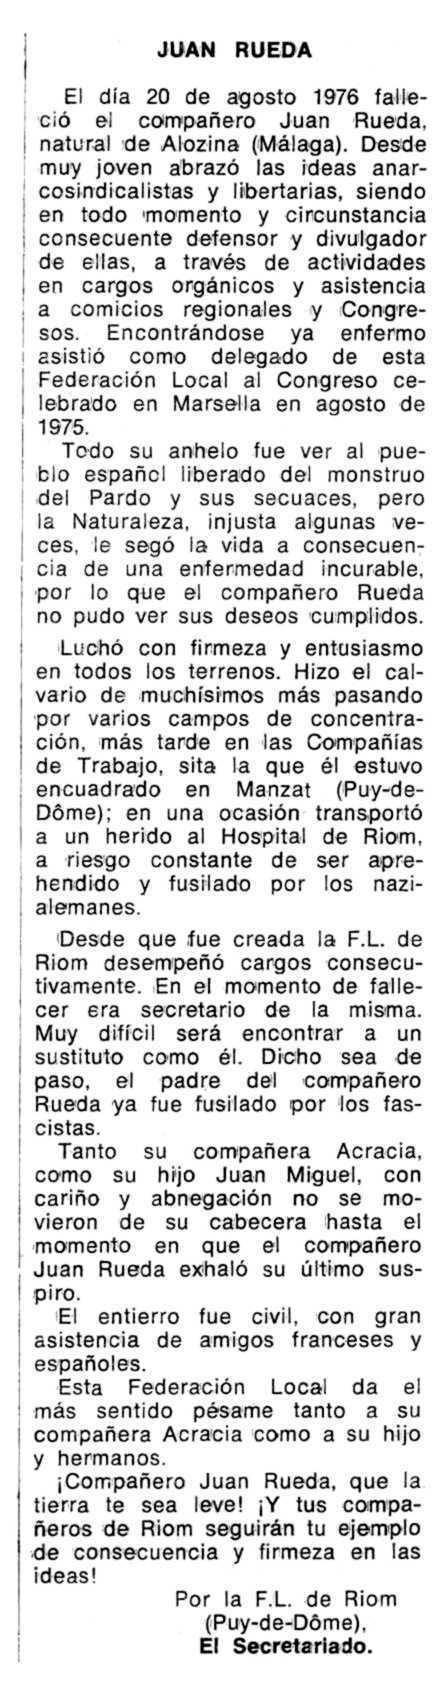 "Necrològica de Juan Rueda apareguda en el periòdic tolosà ""Espoir"" del 26 de desembre de 1976"